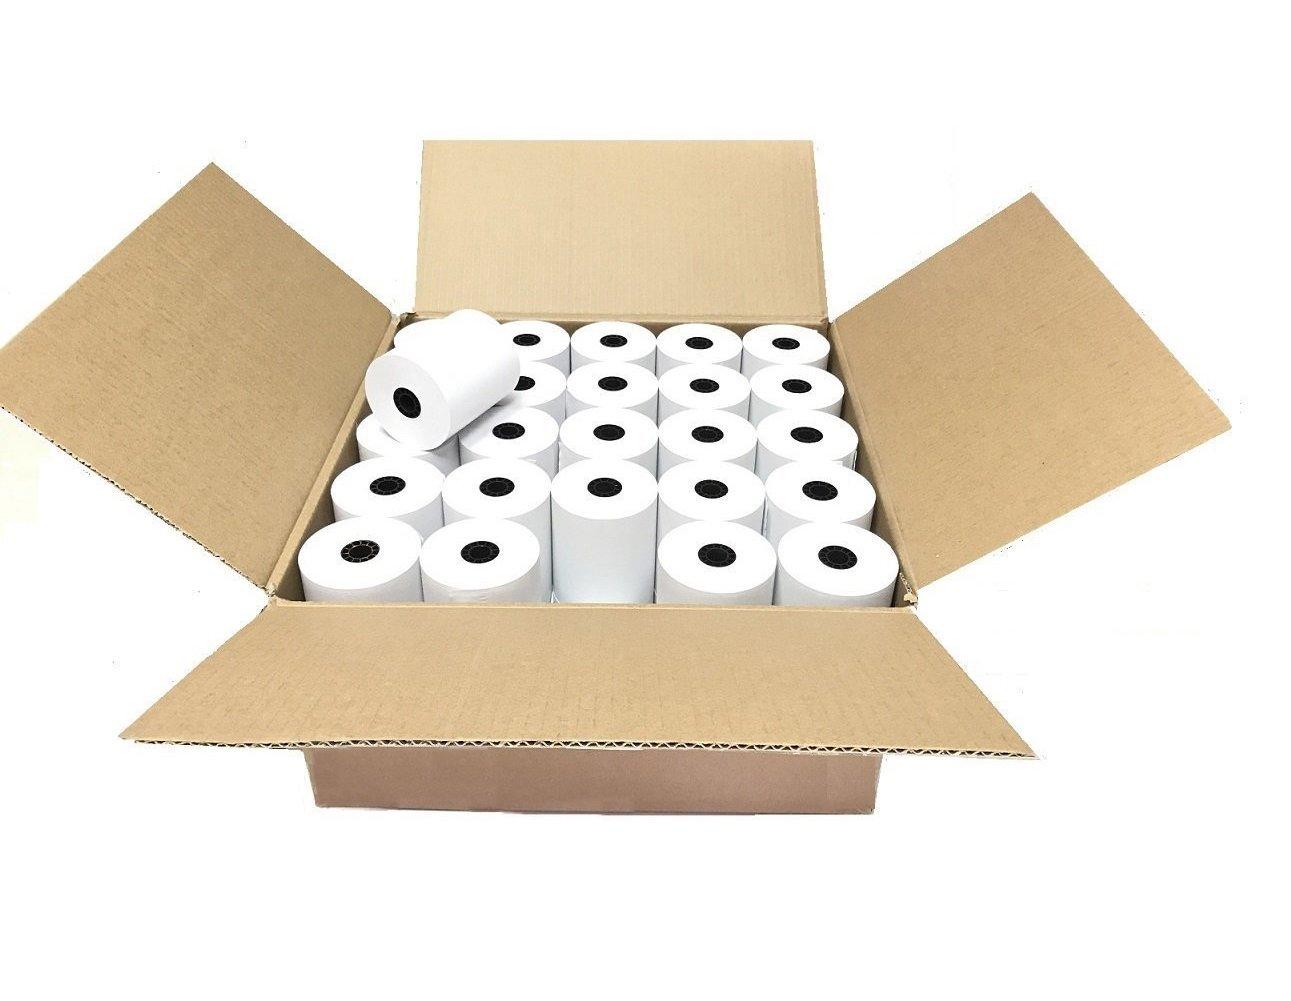 SJPACK Thermal Paper 2 1/4'' x 50' Pos Receipt Paper, 50 rolls Cash Register Roll by SJPACK